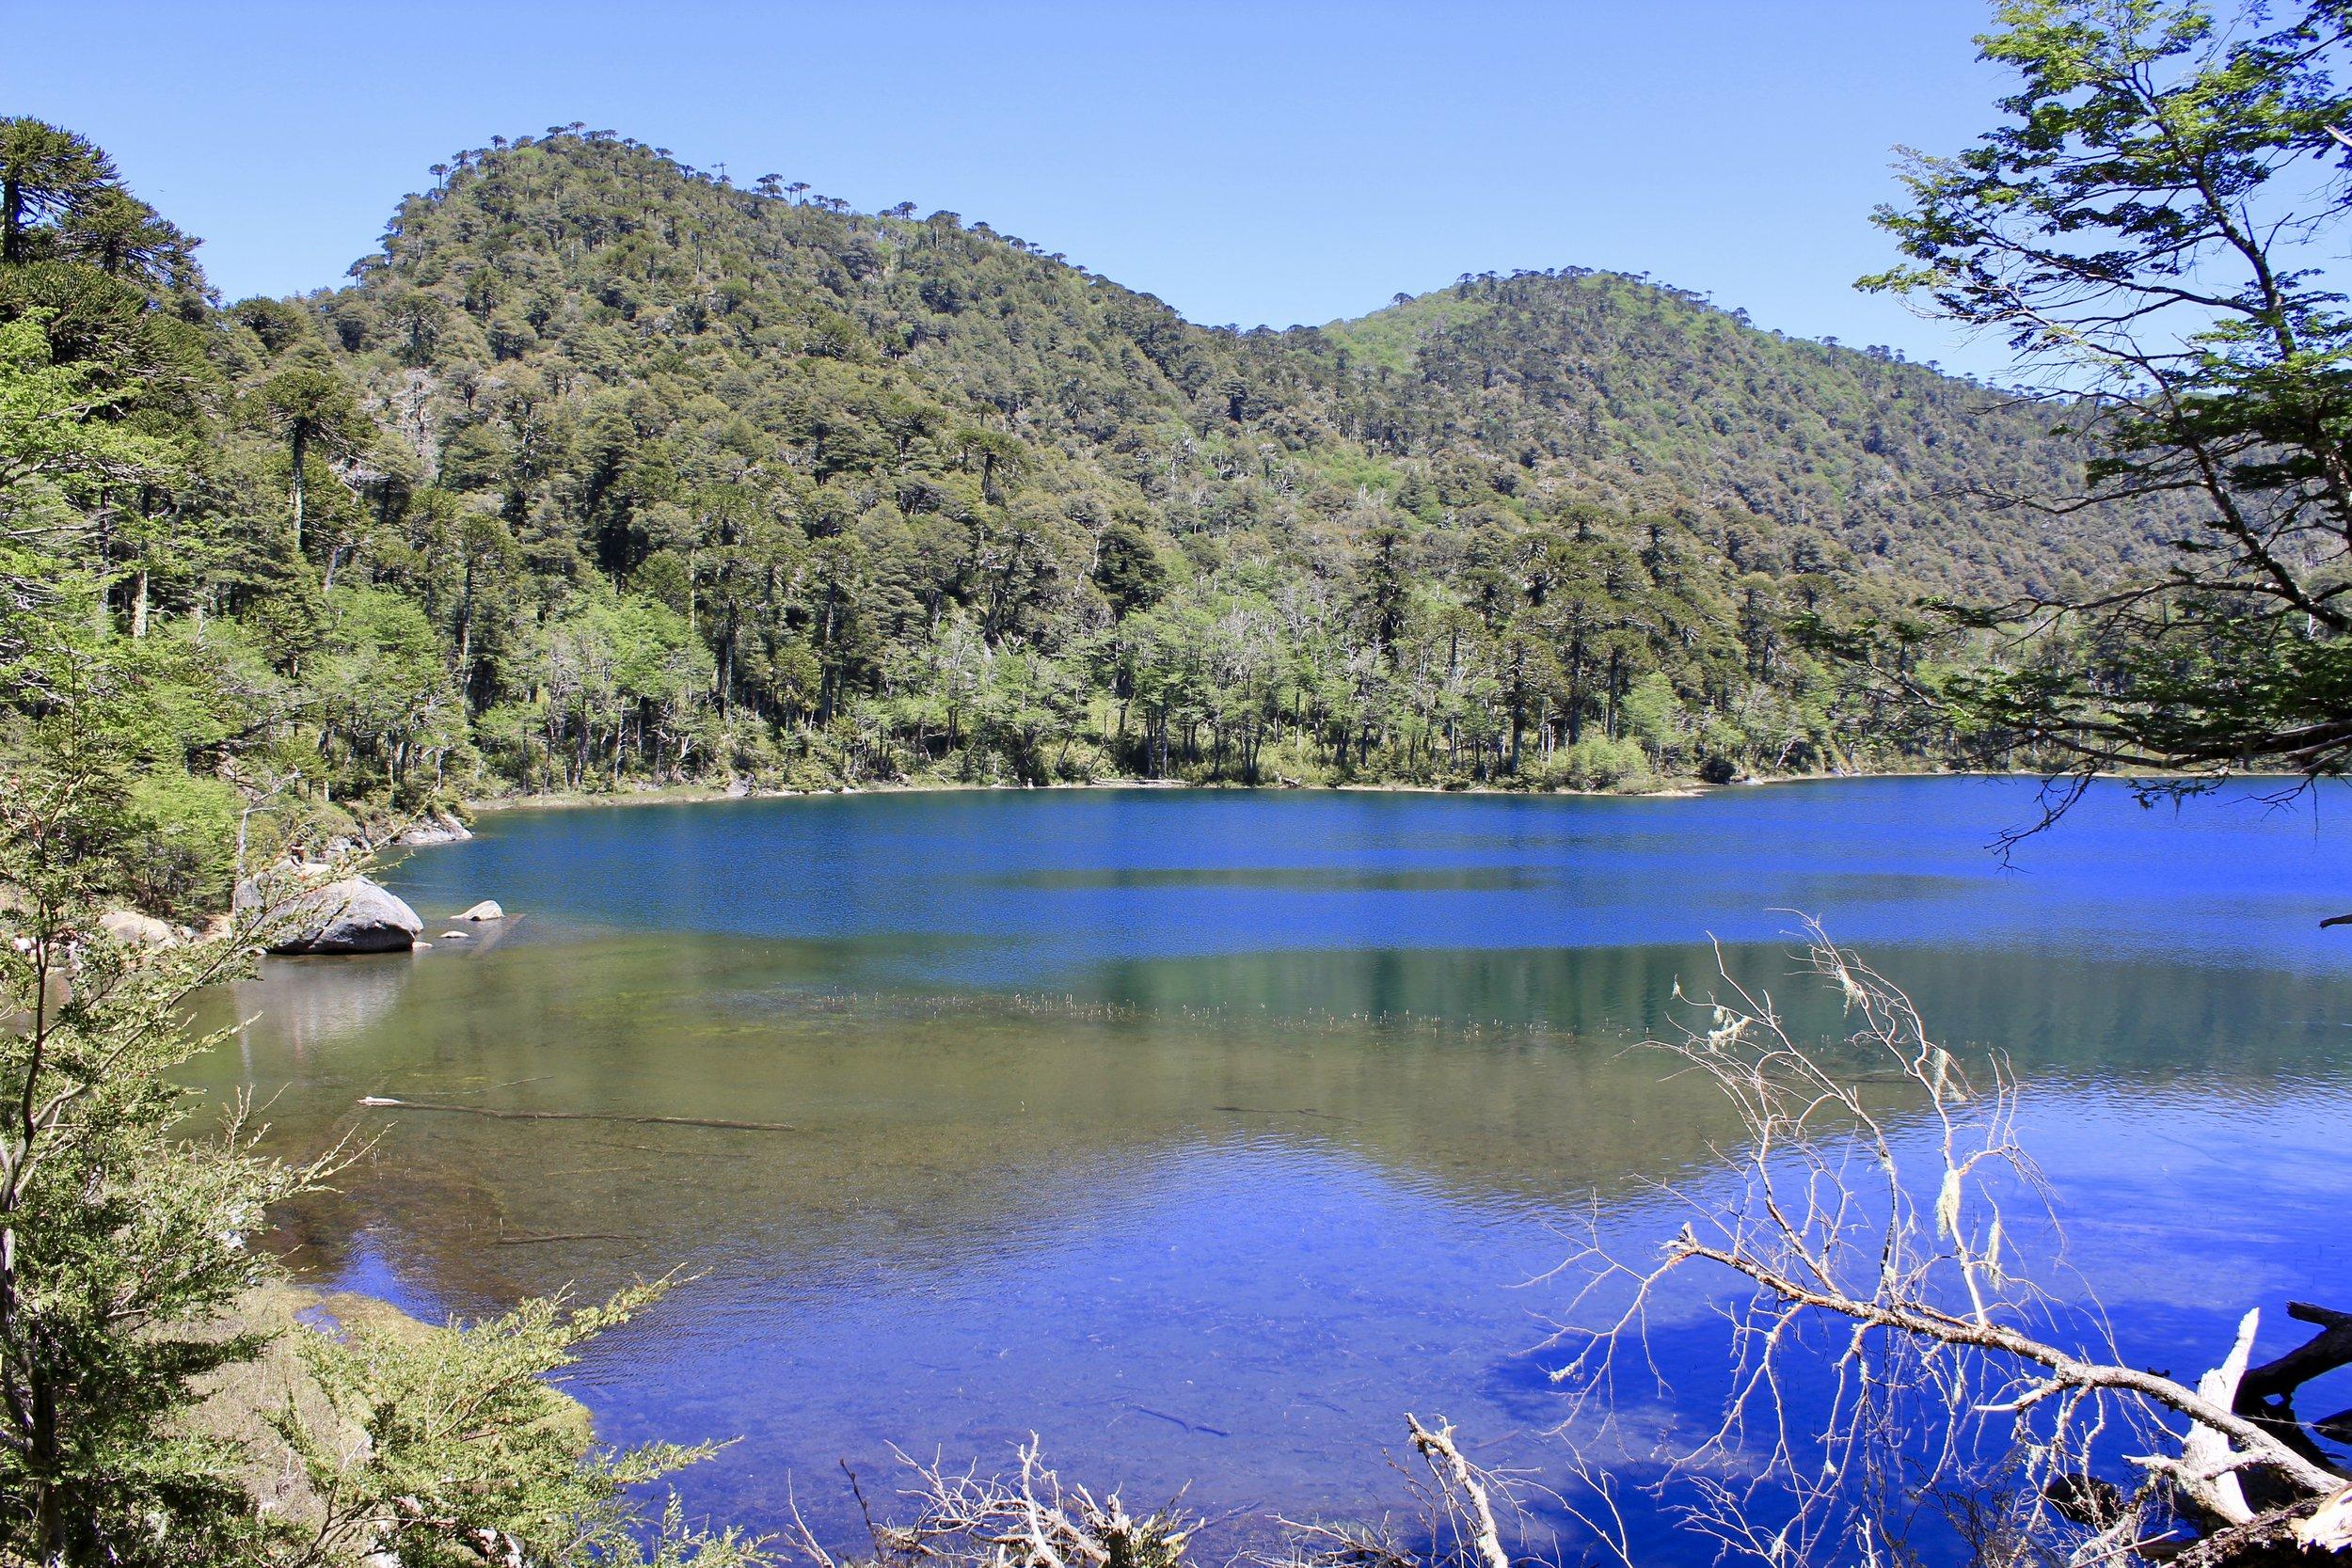 Lake Verde